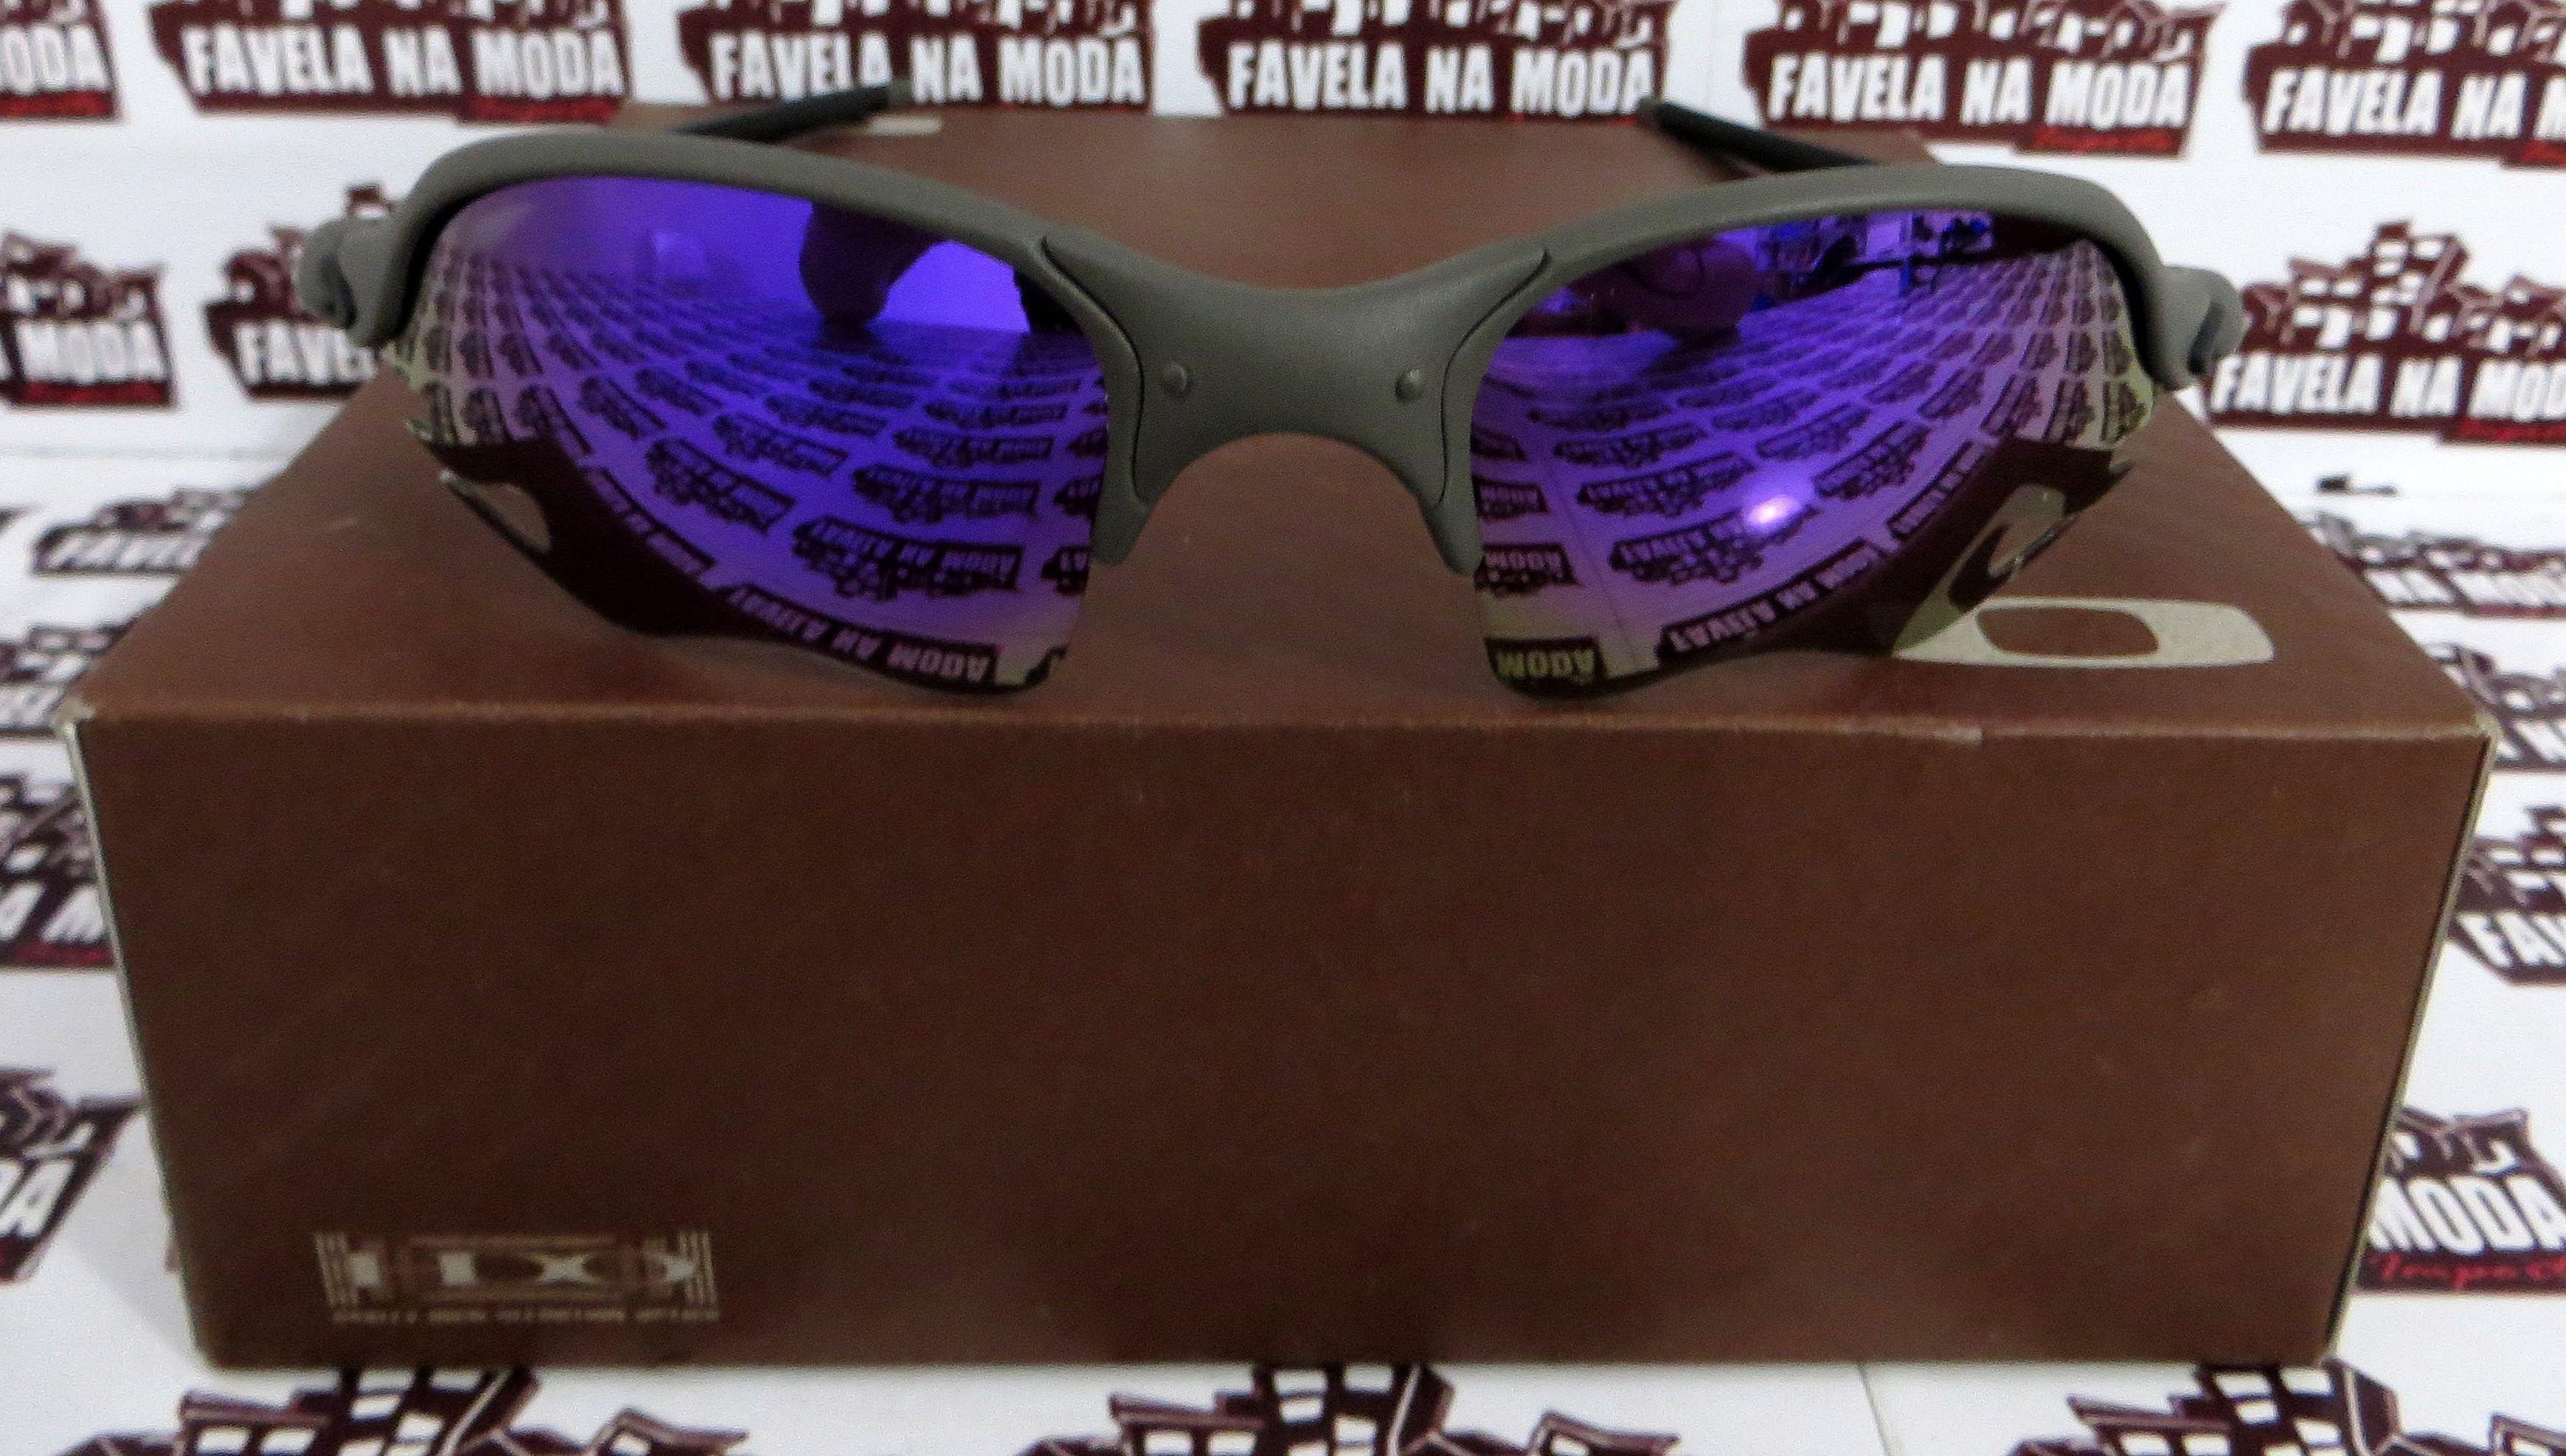 2602c67d50413 Óculos Oakley Romeo 2 - X-Metal   Violet (flame)   Borrachas Preta